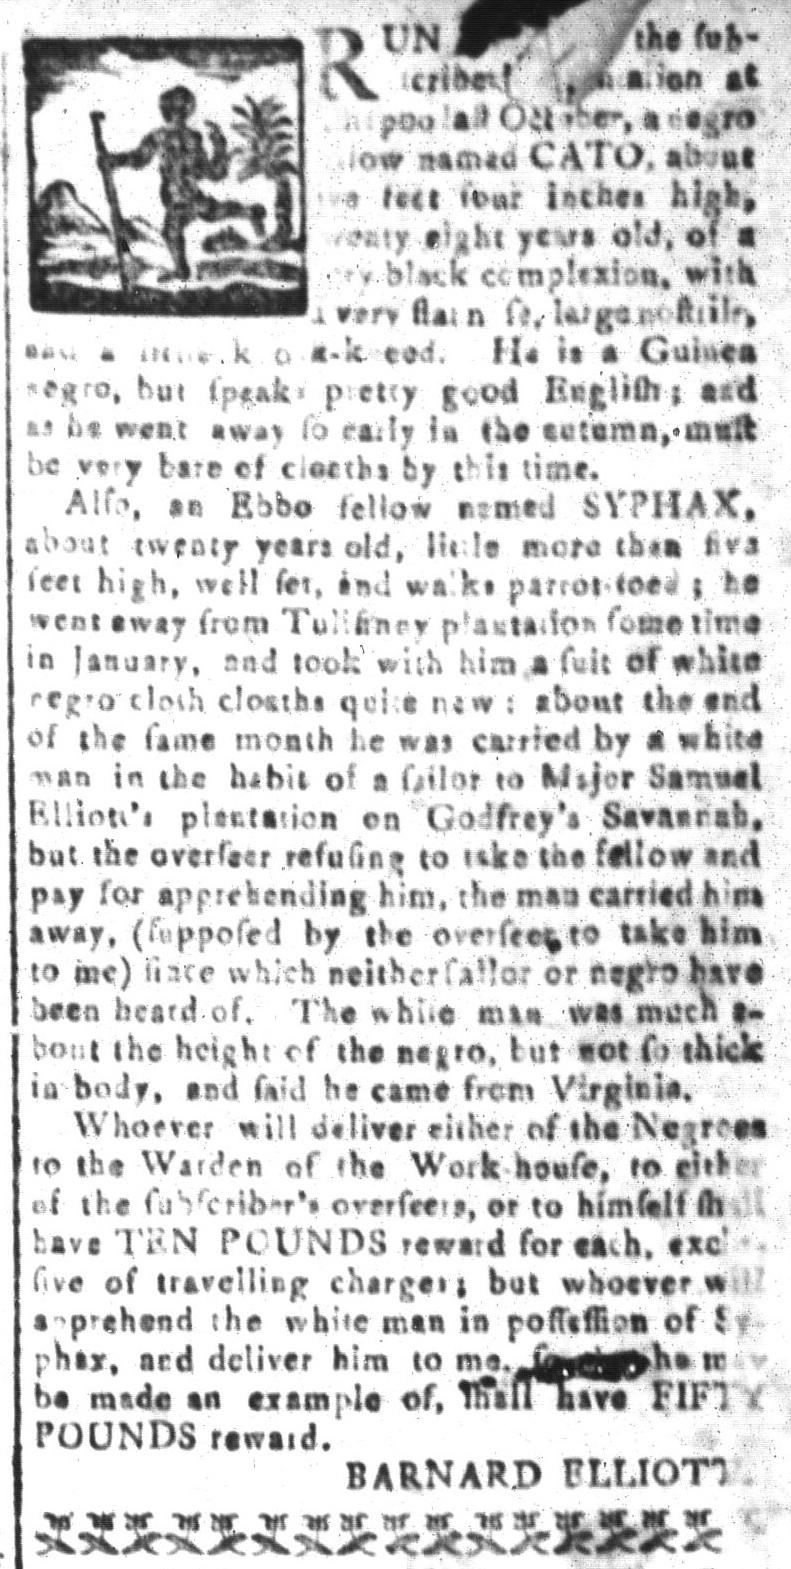 Apr 8 - South-Carolina and American General Gazette Slavery 11